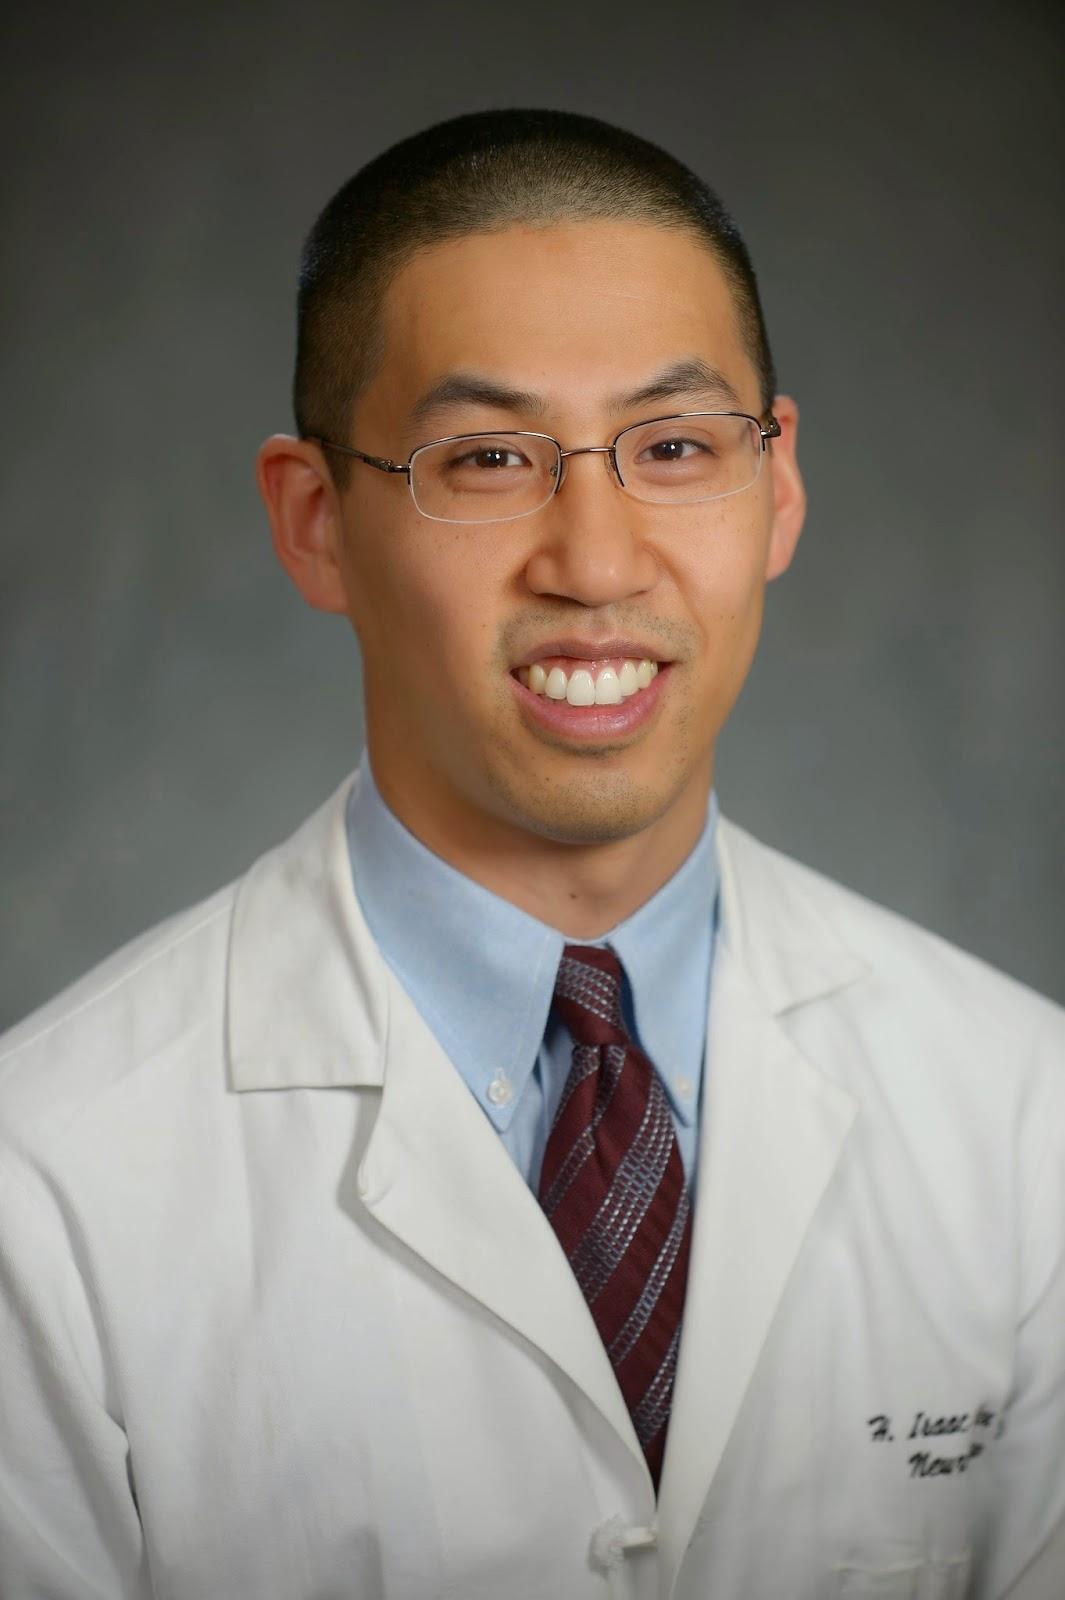 Penn Neurosurgery